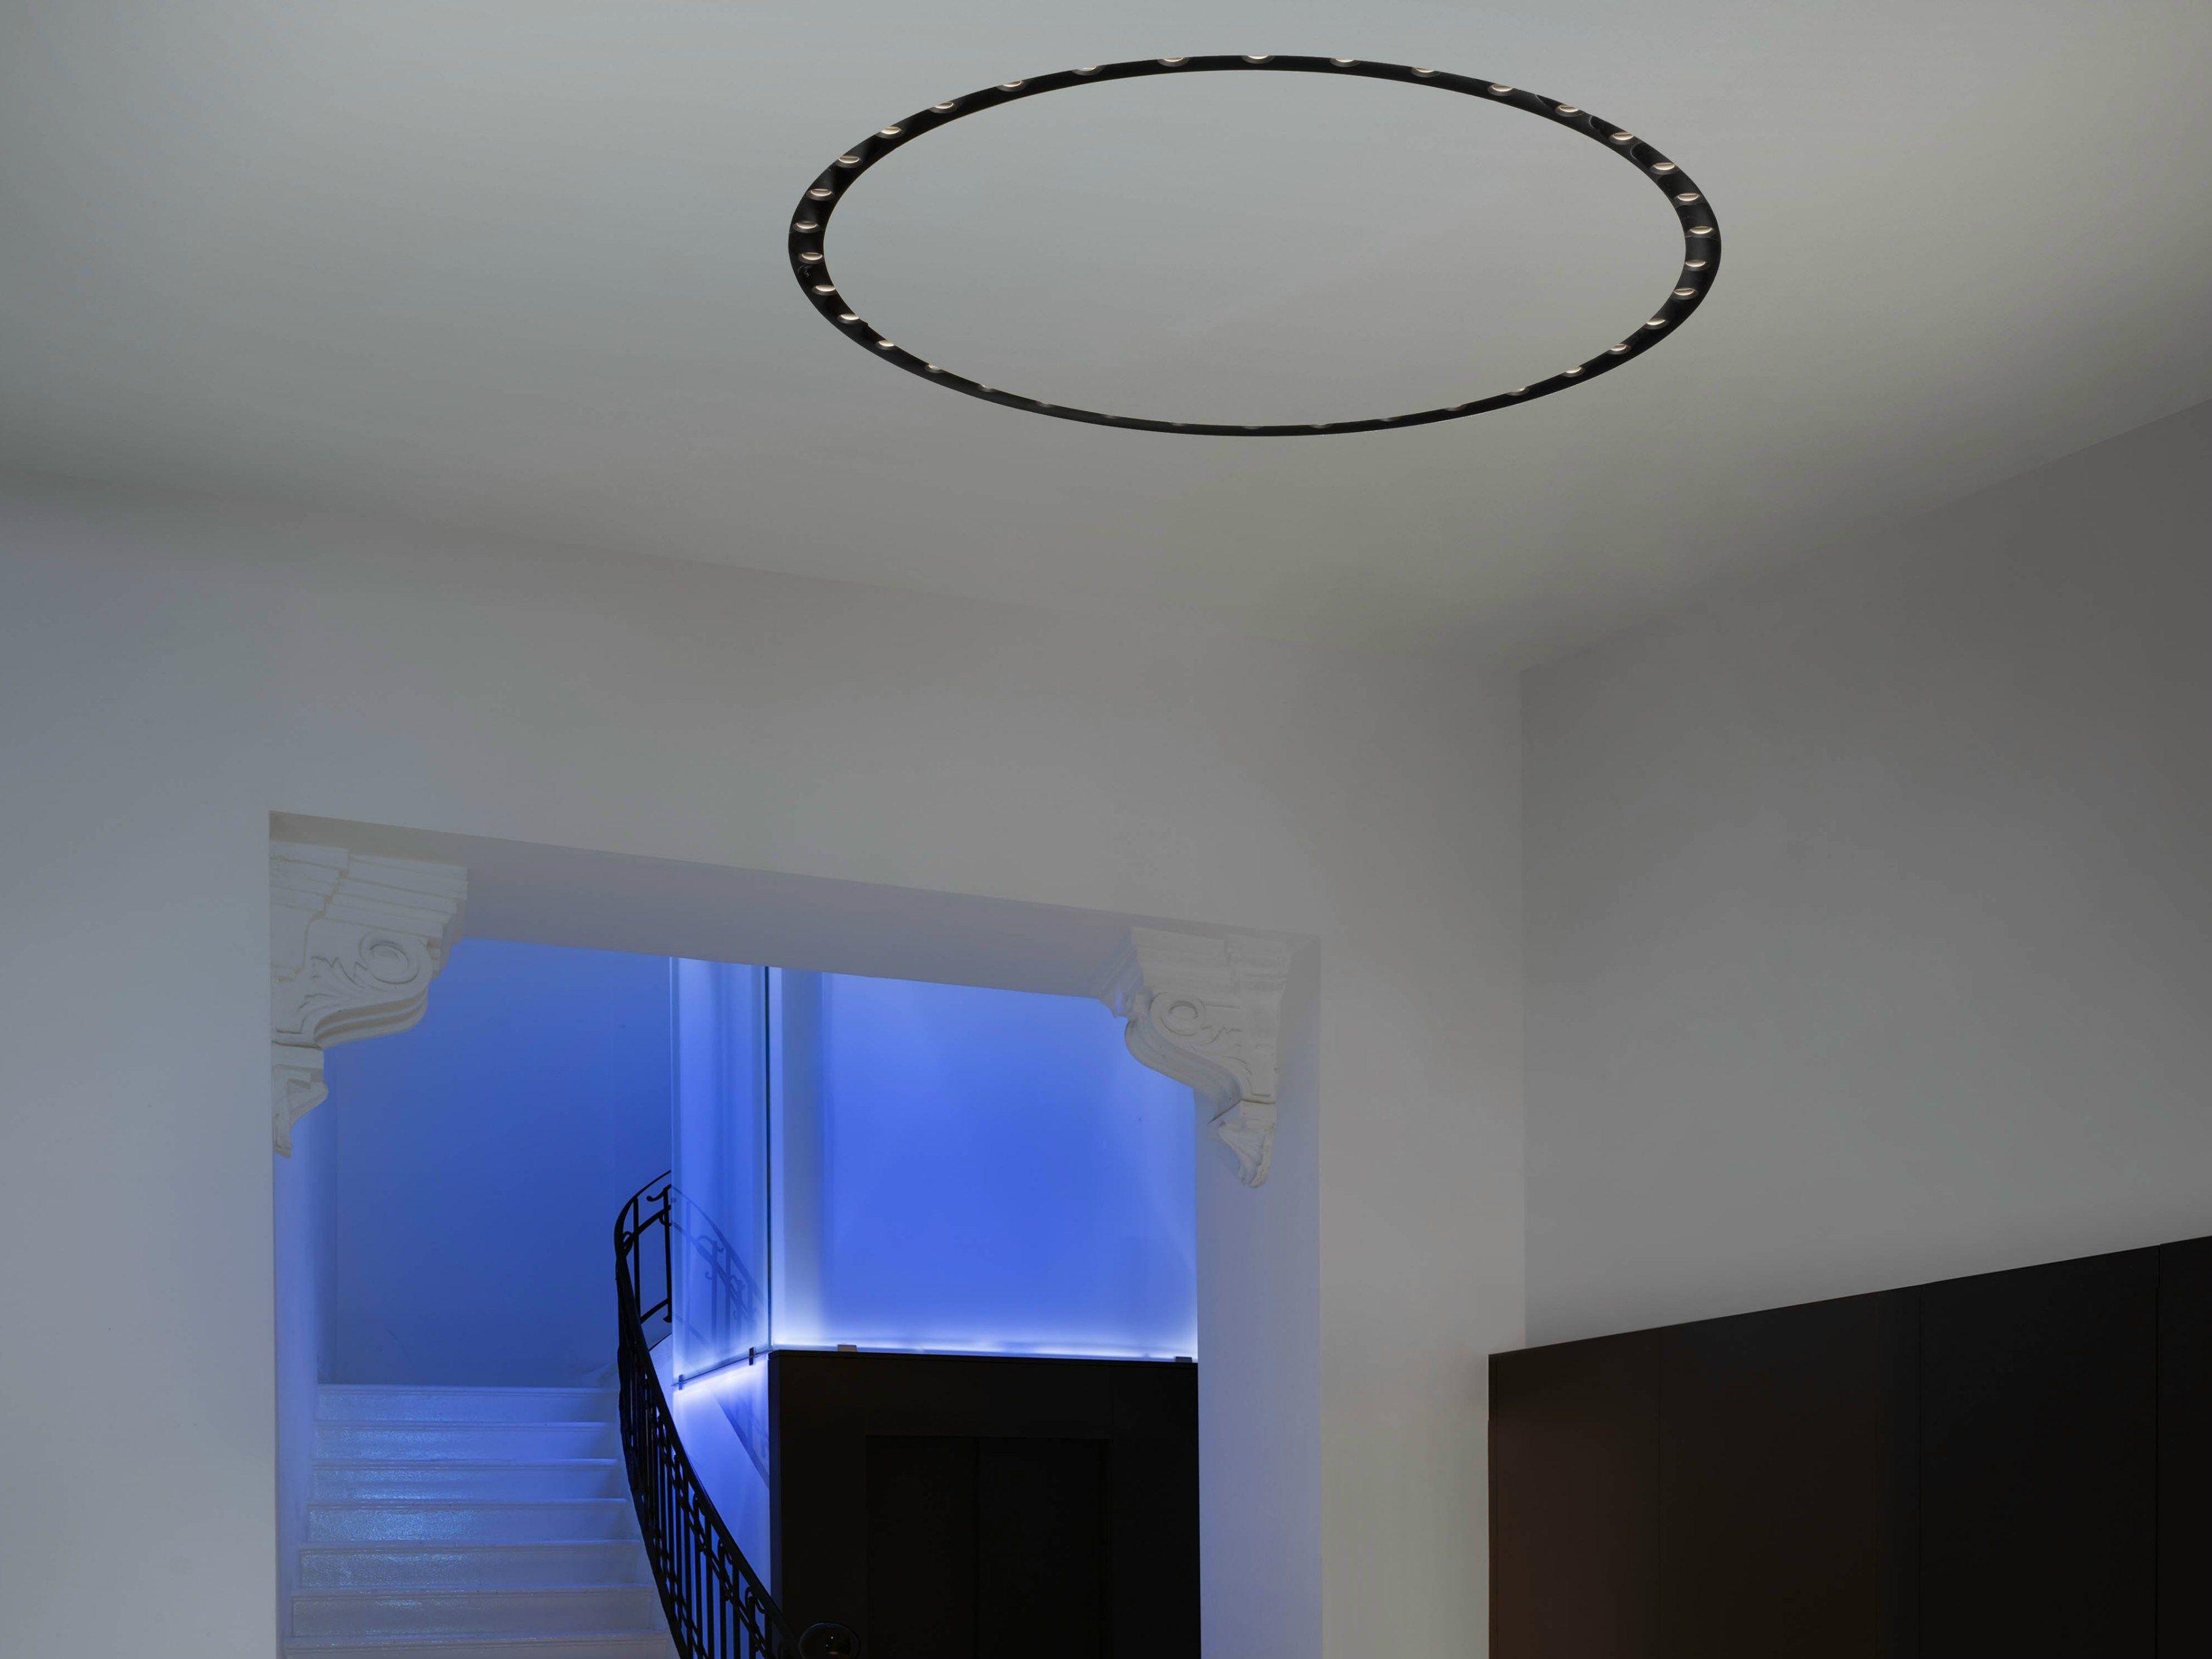 Built In Lighting Profile For Led Modules Circle Of Light